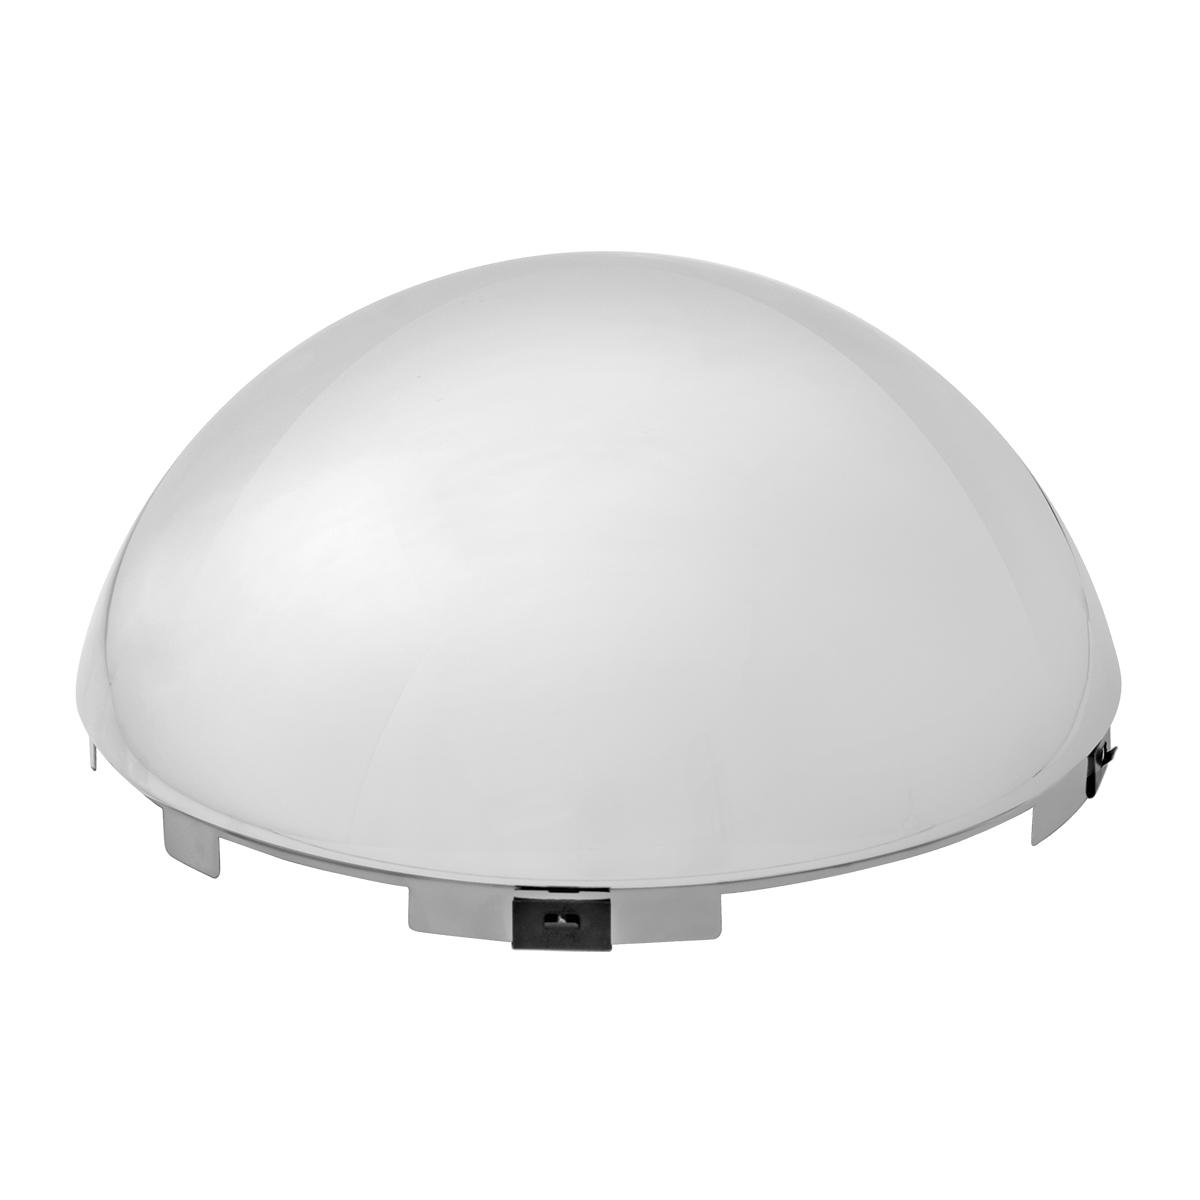 10672 Universal Front Hub Cap in Full Moon Shape